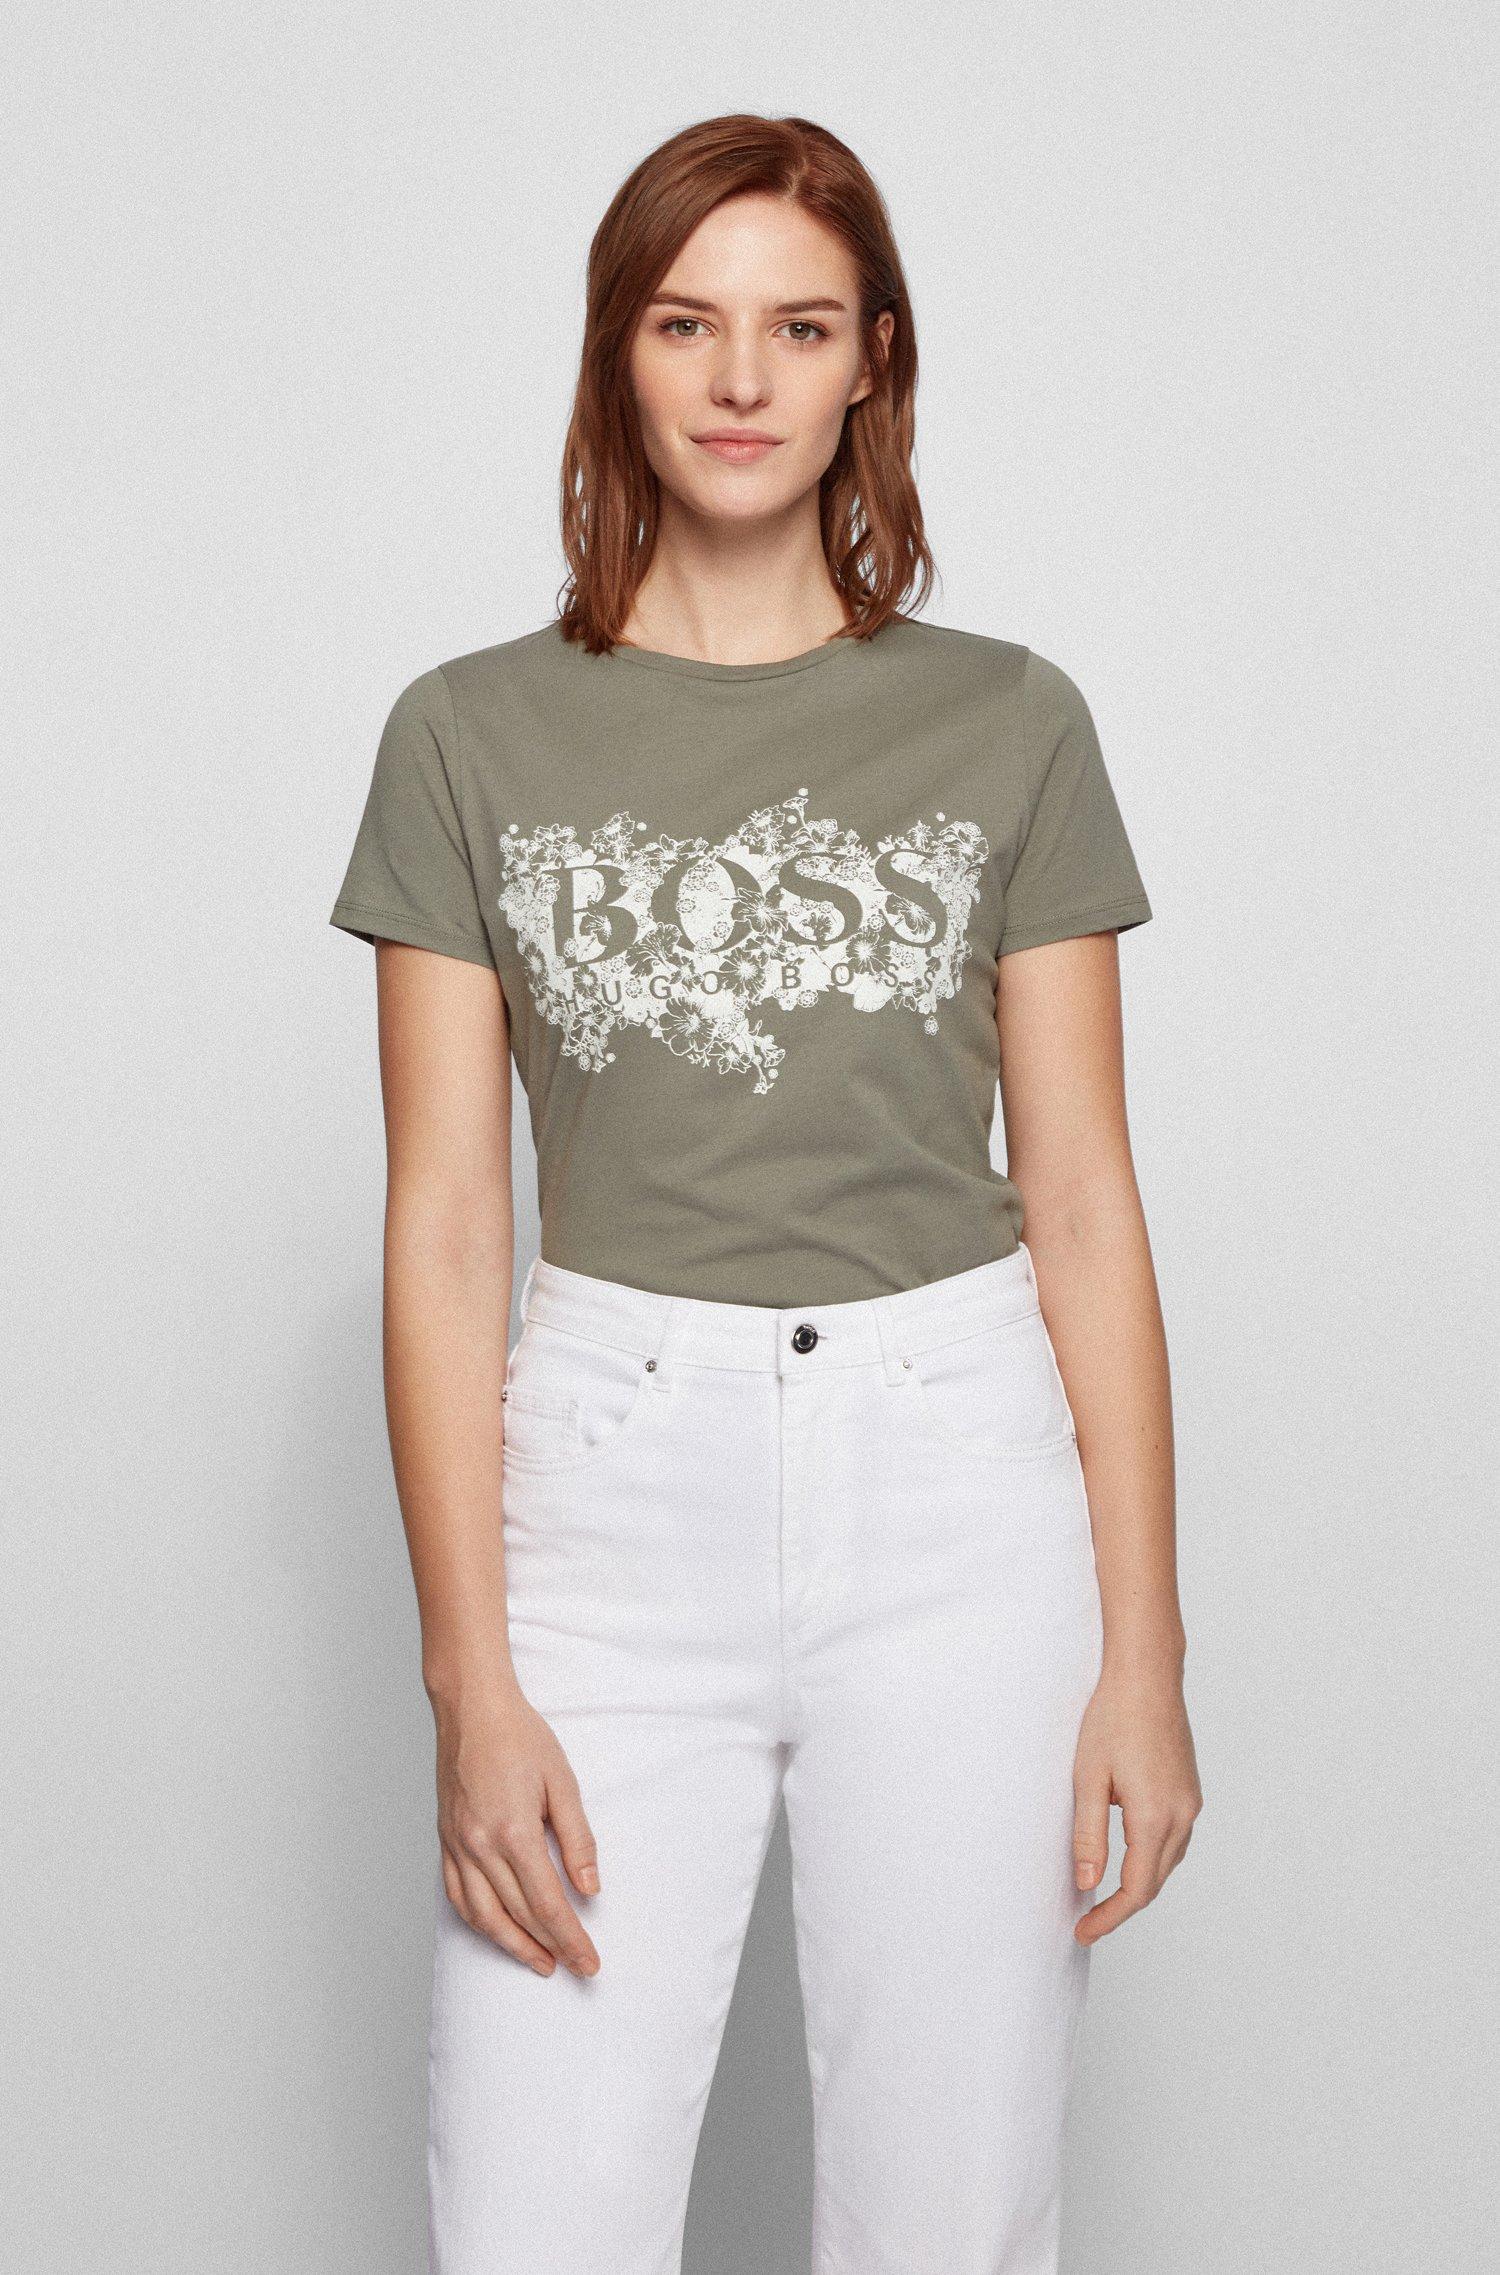 Organic-cotton T-shirt with floral-themed logo artwork, Dark Green